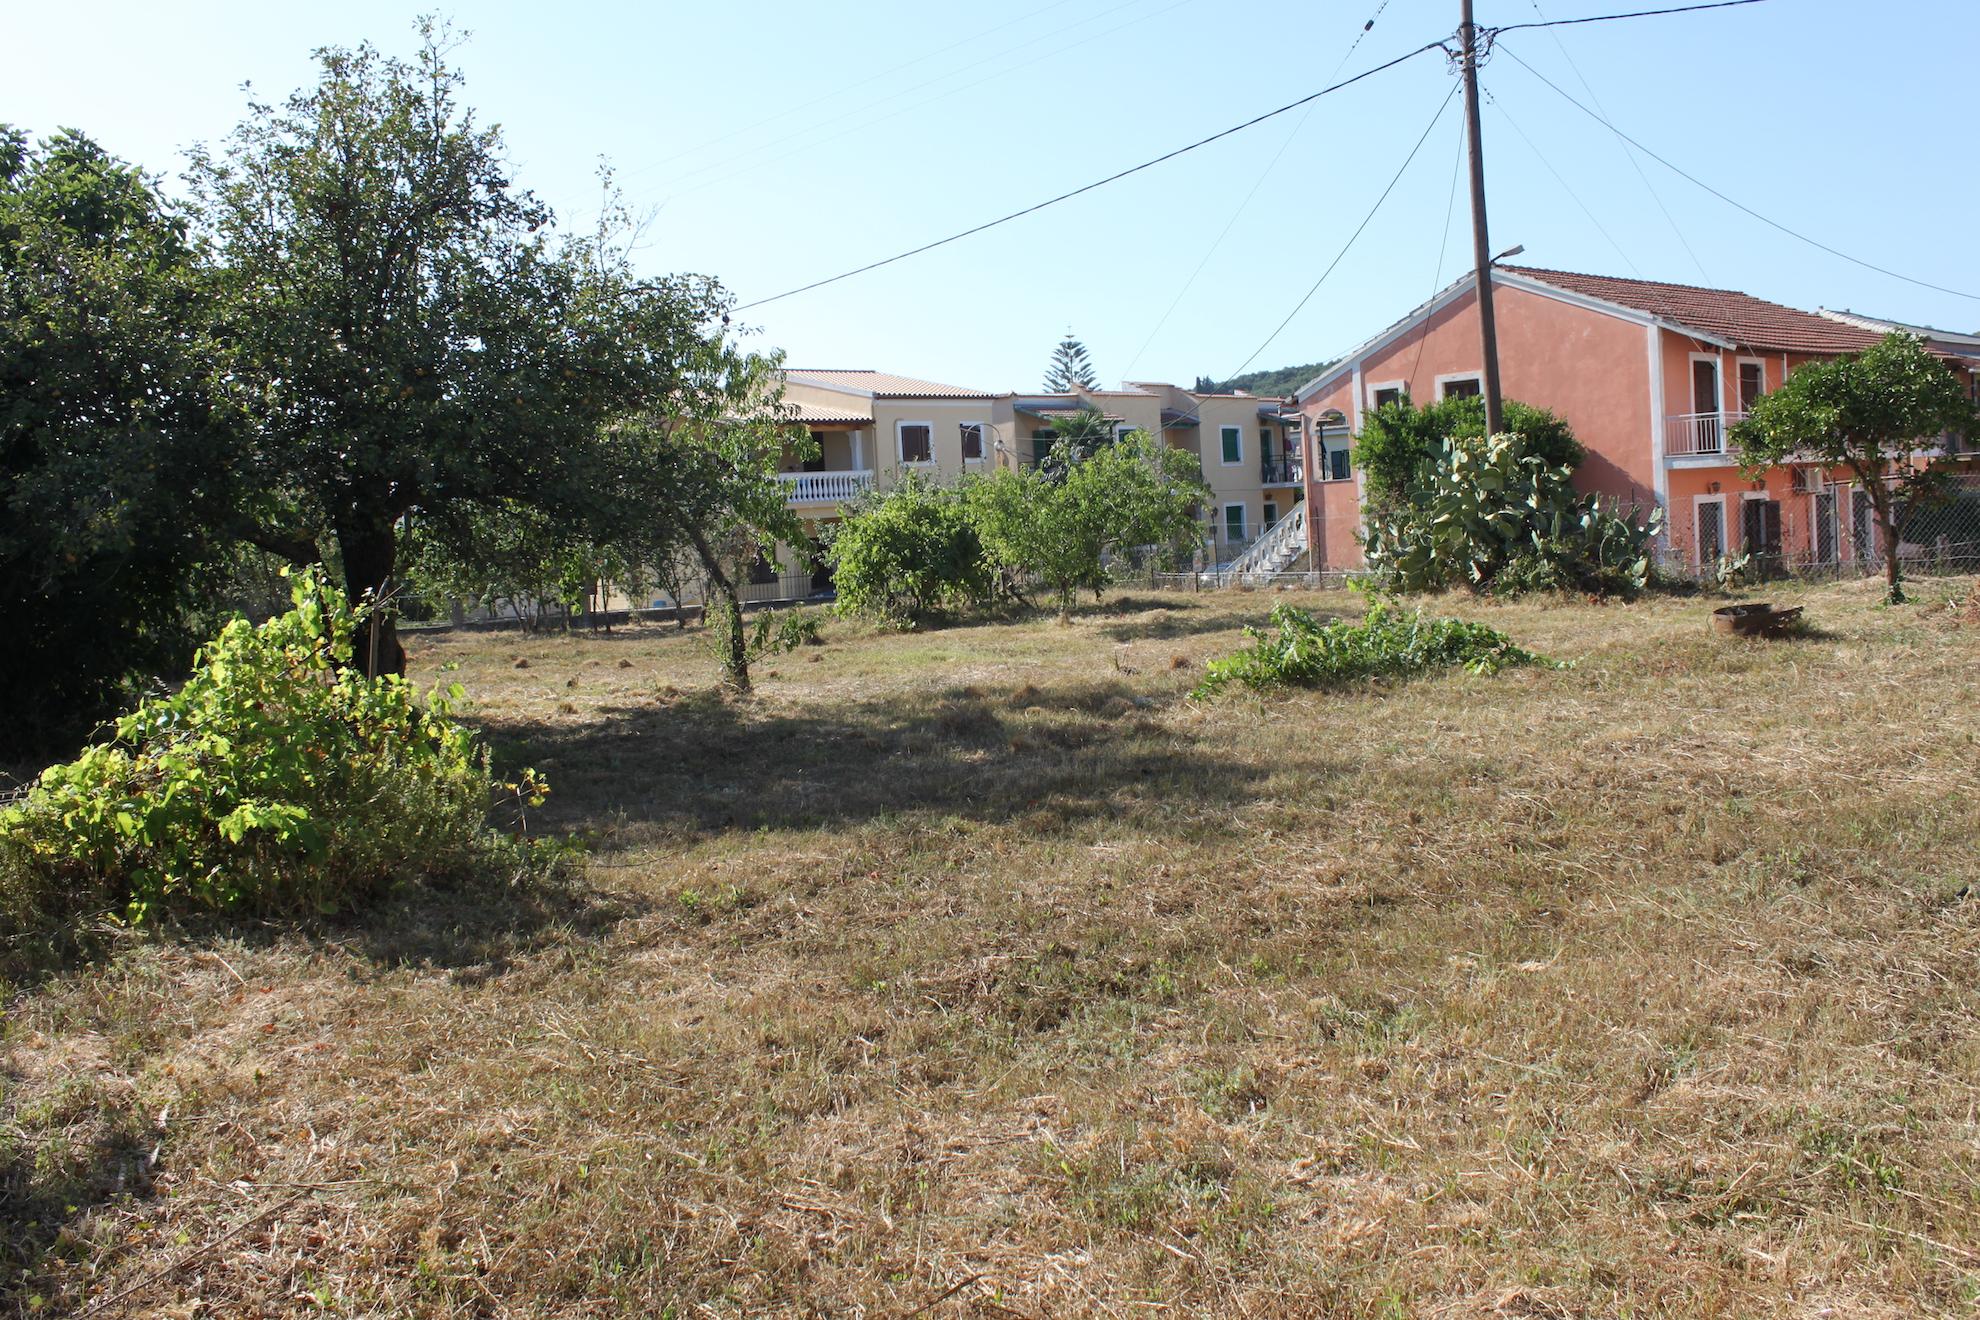 Rouvas land, July 2016 (10).JPG